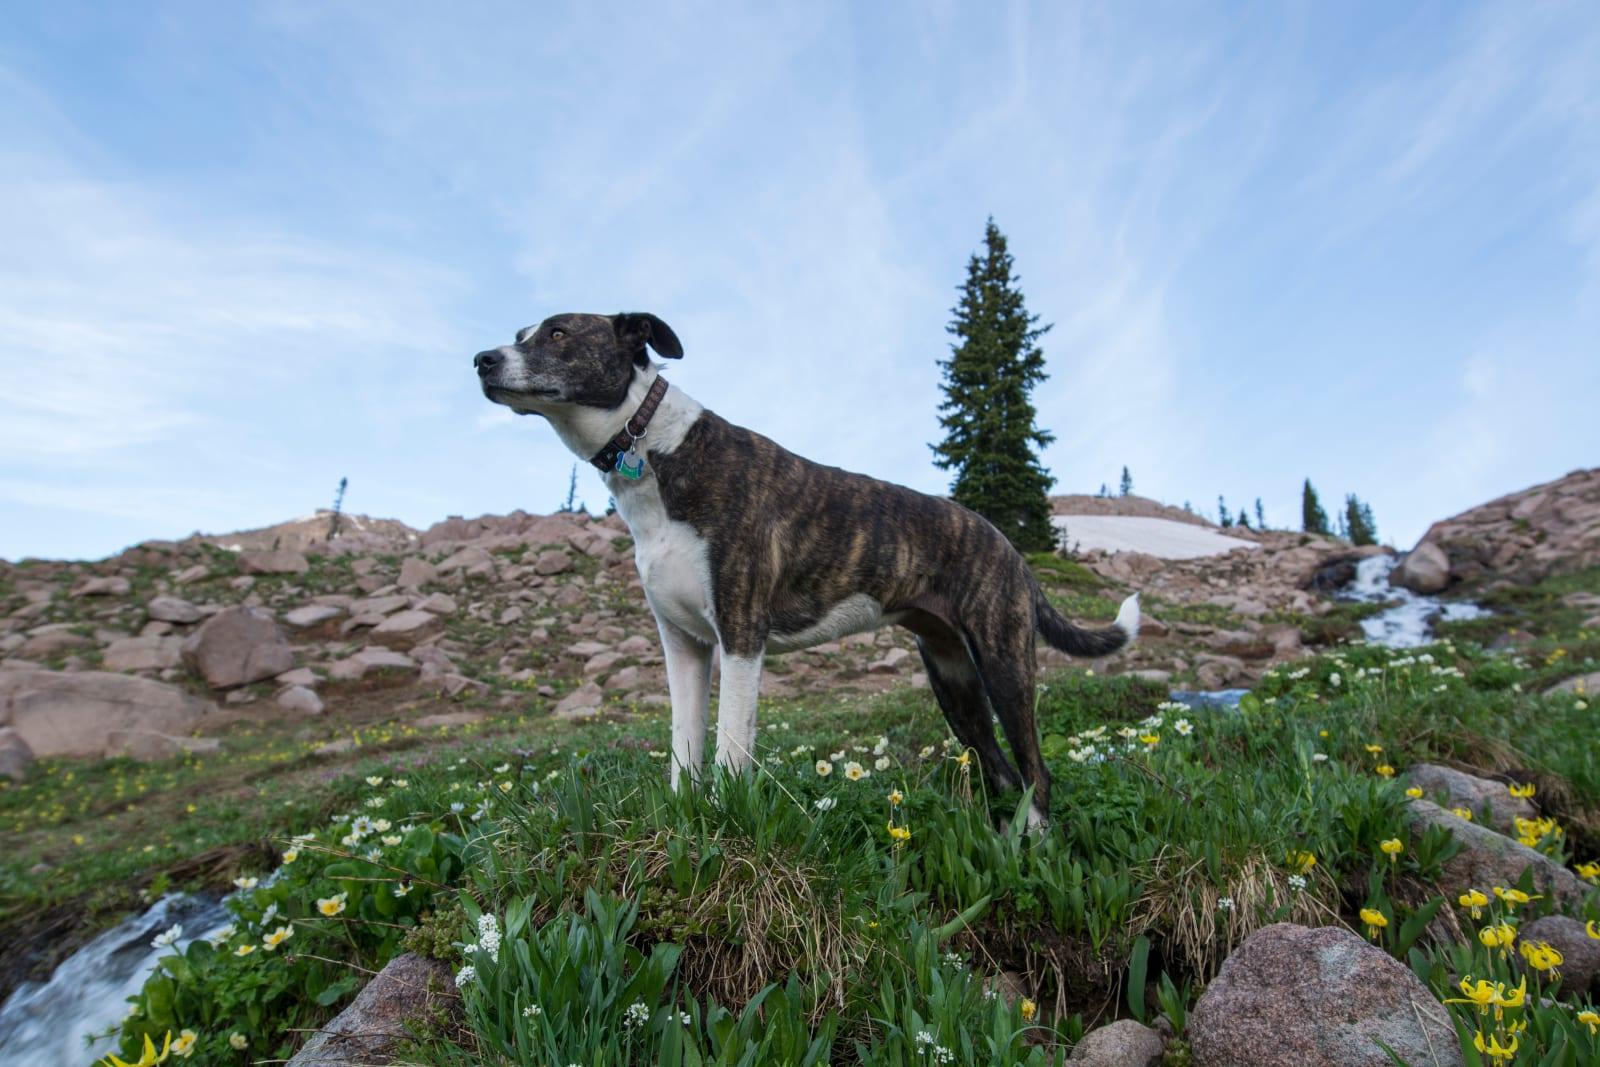 Mount Zirkel Wilderness Backpacking Dog Stream